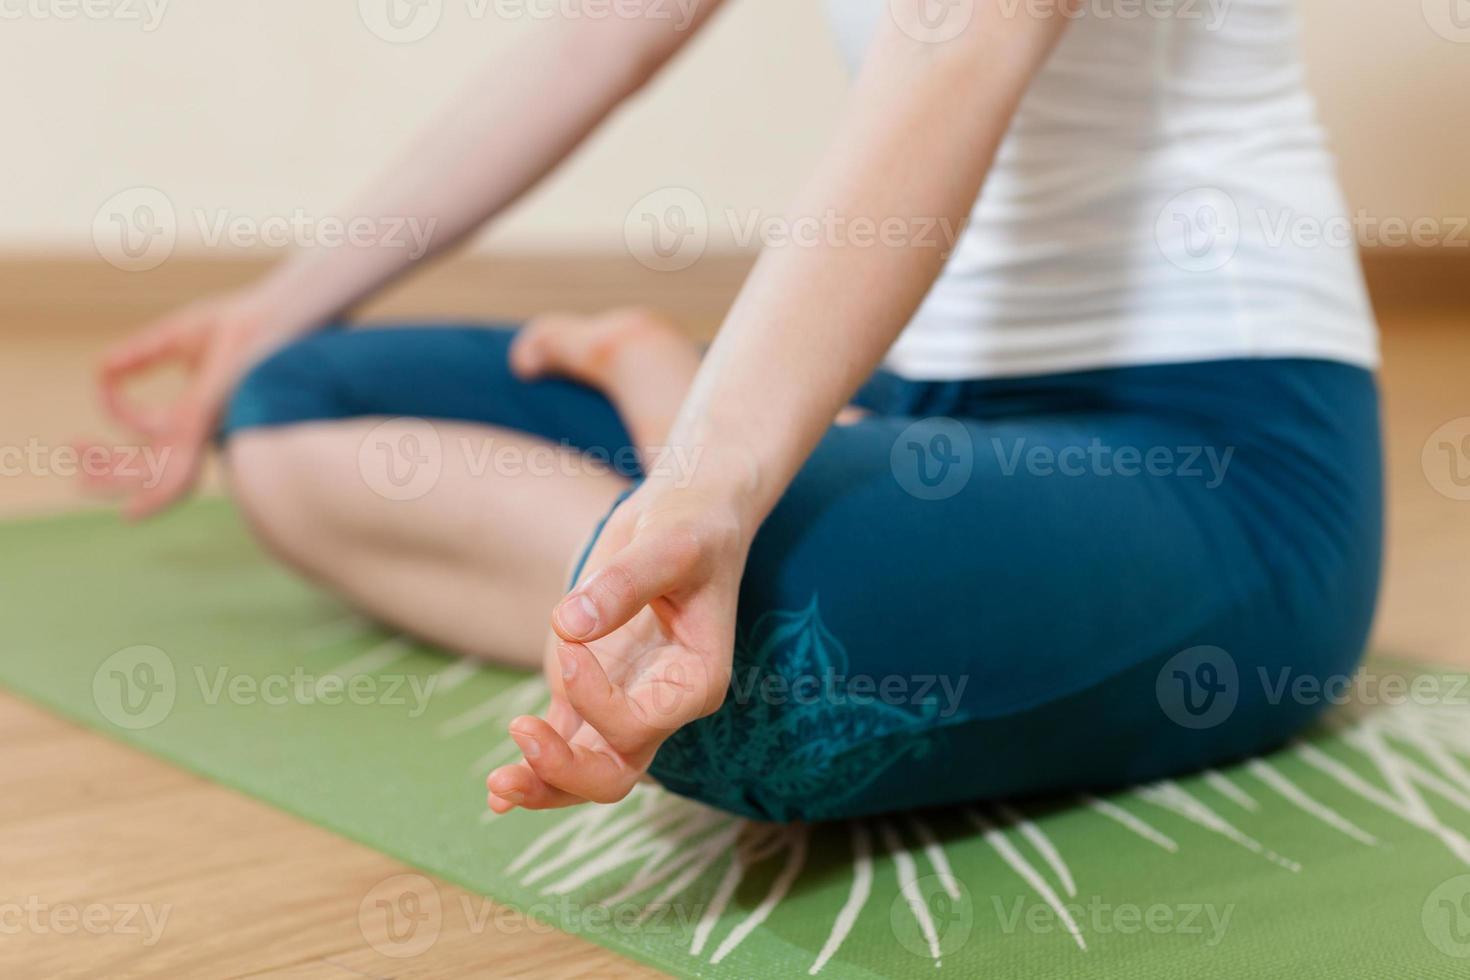 Kaukasische vrouw beoefent yoga in studio (ardkhapadmasana) foto